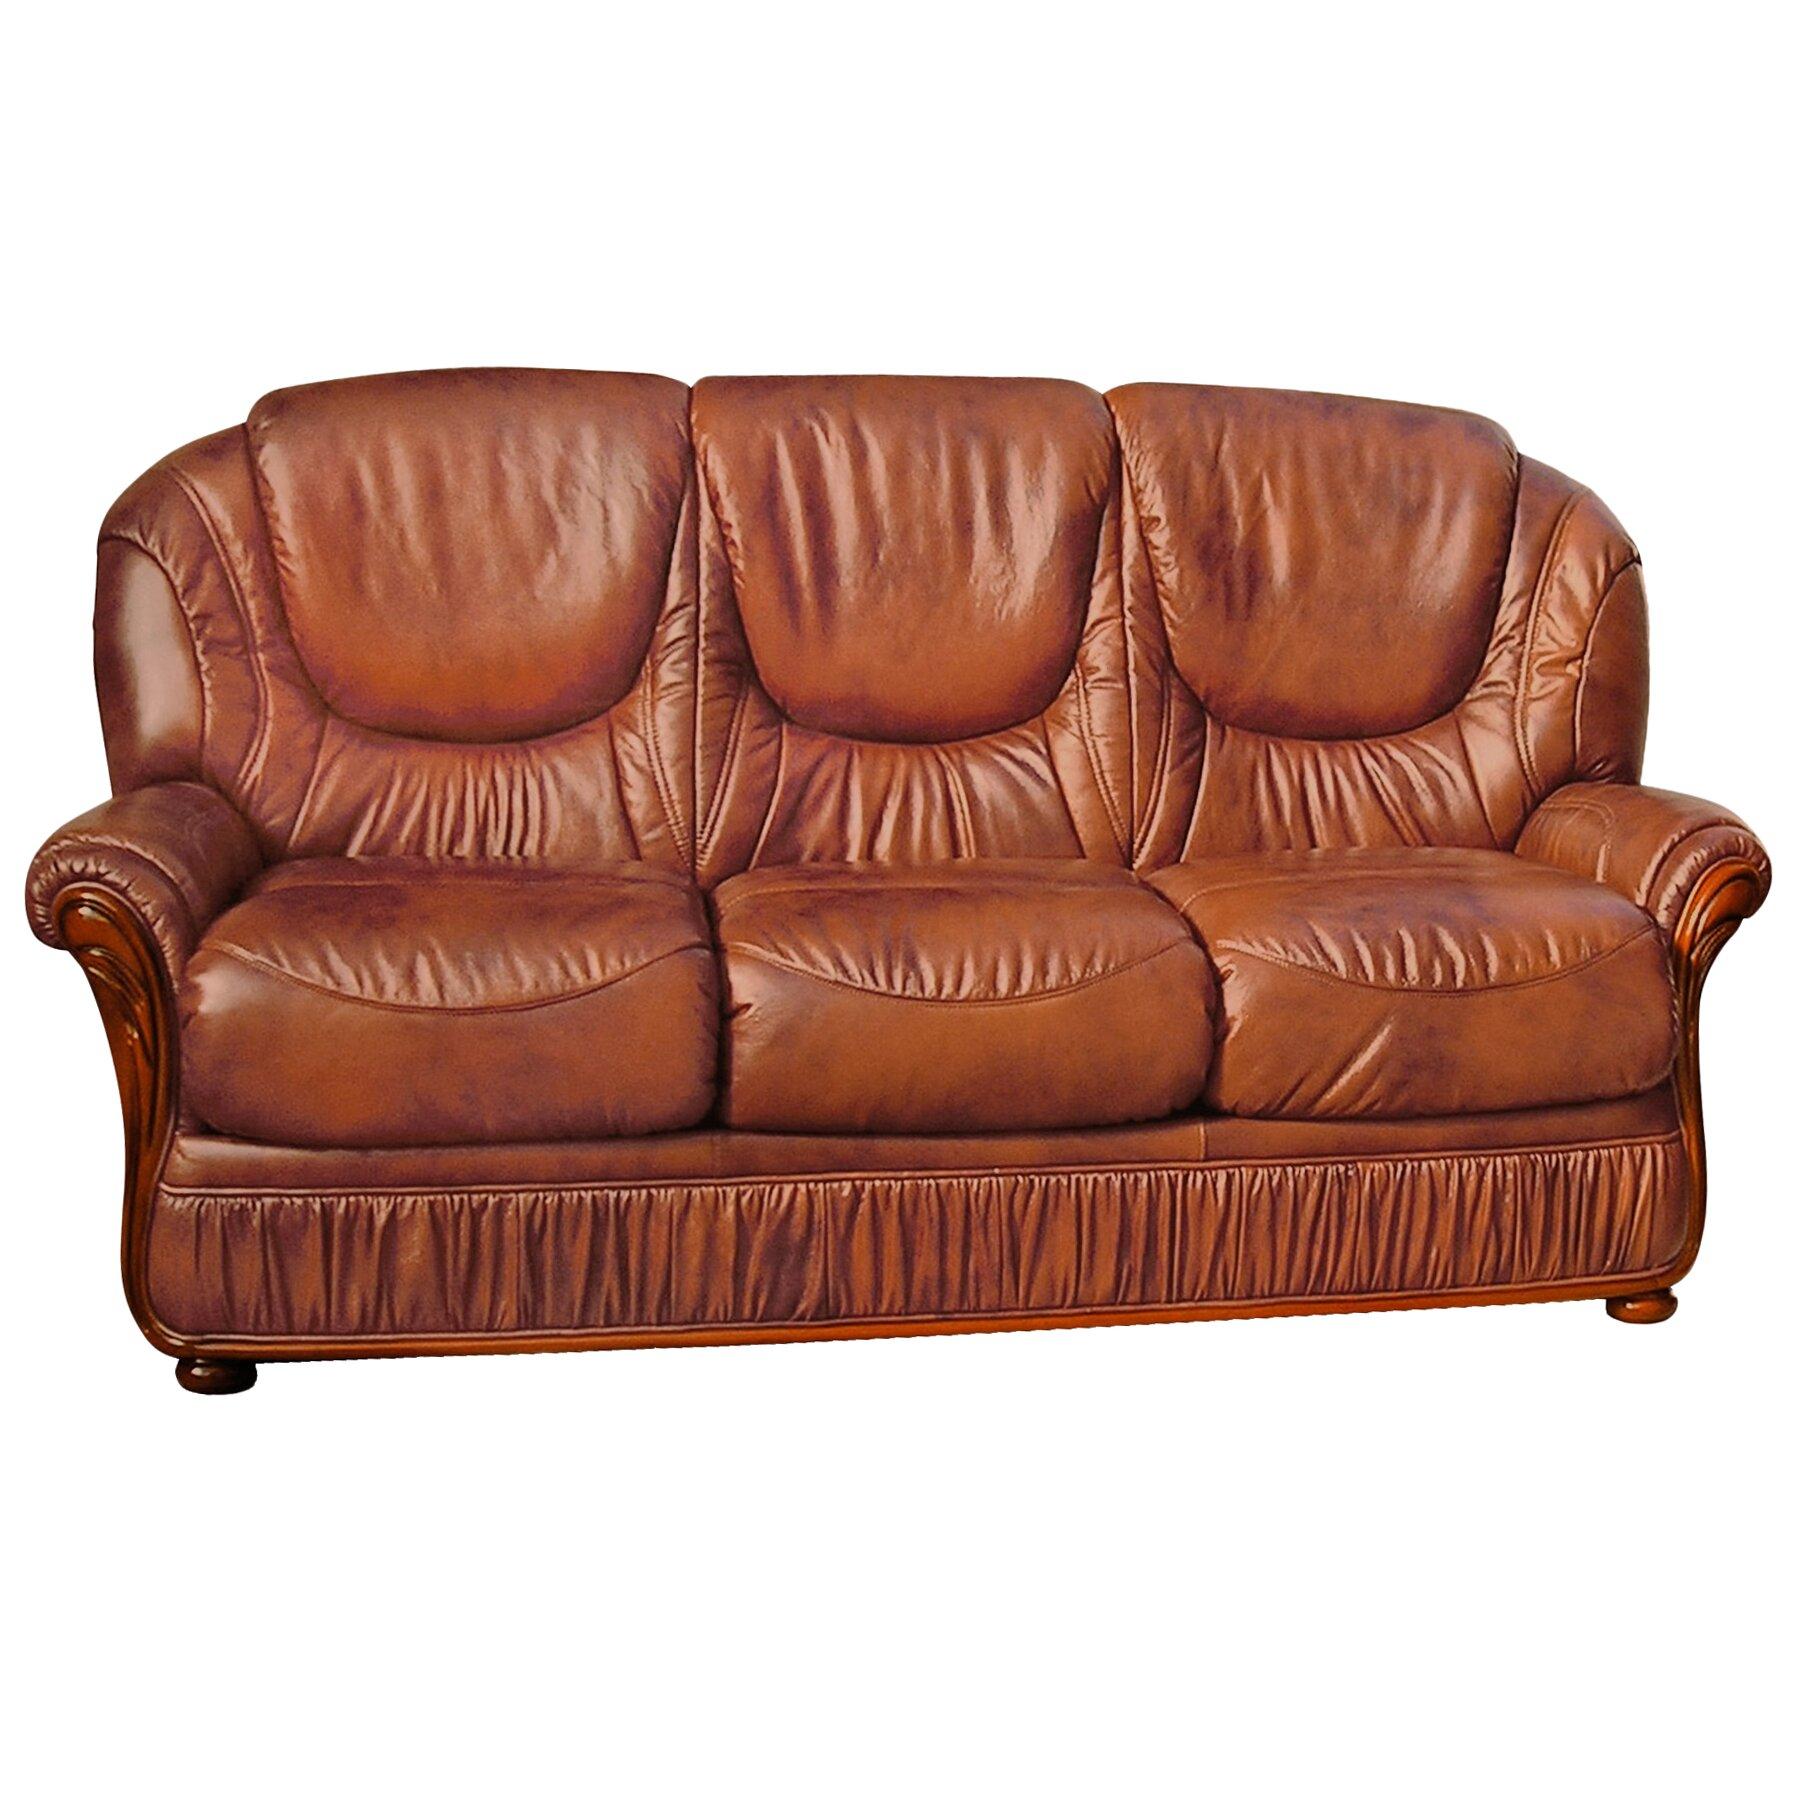 Maxi Comfort Collection Florida 3 Seater Sofa